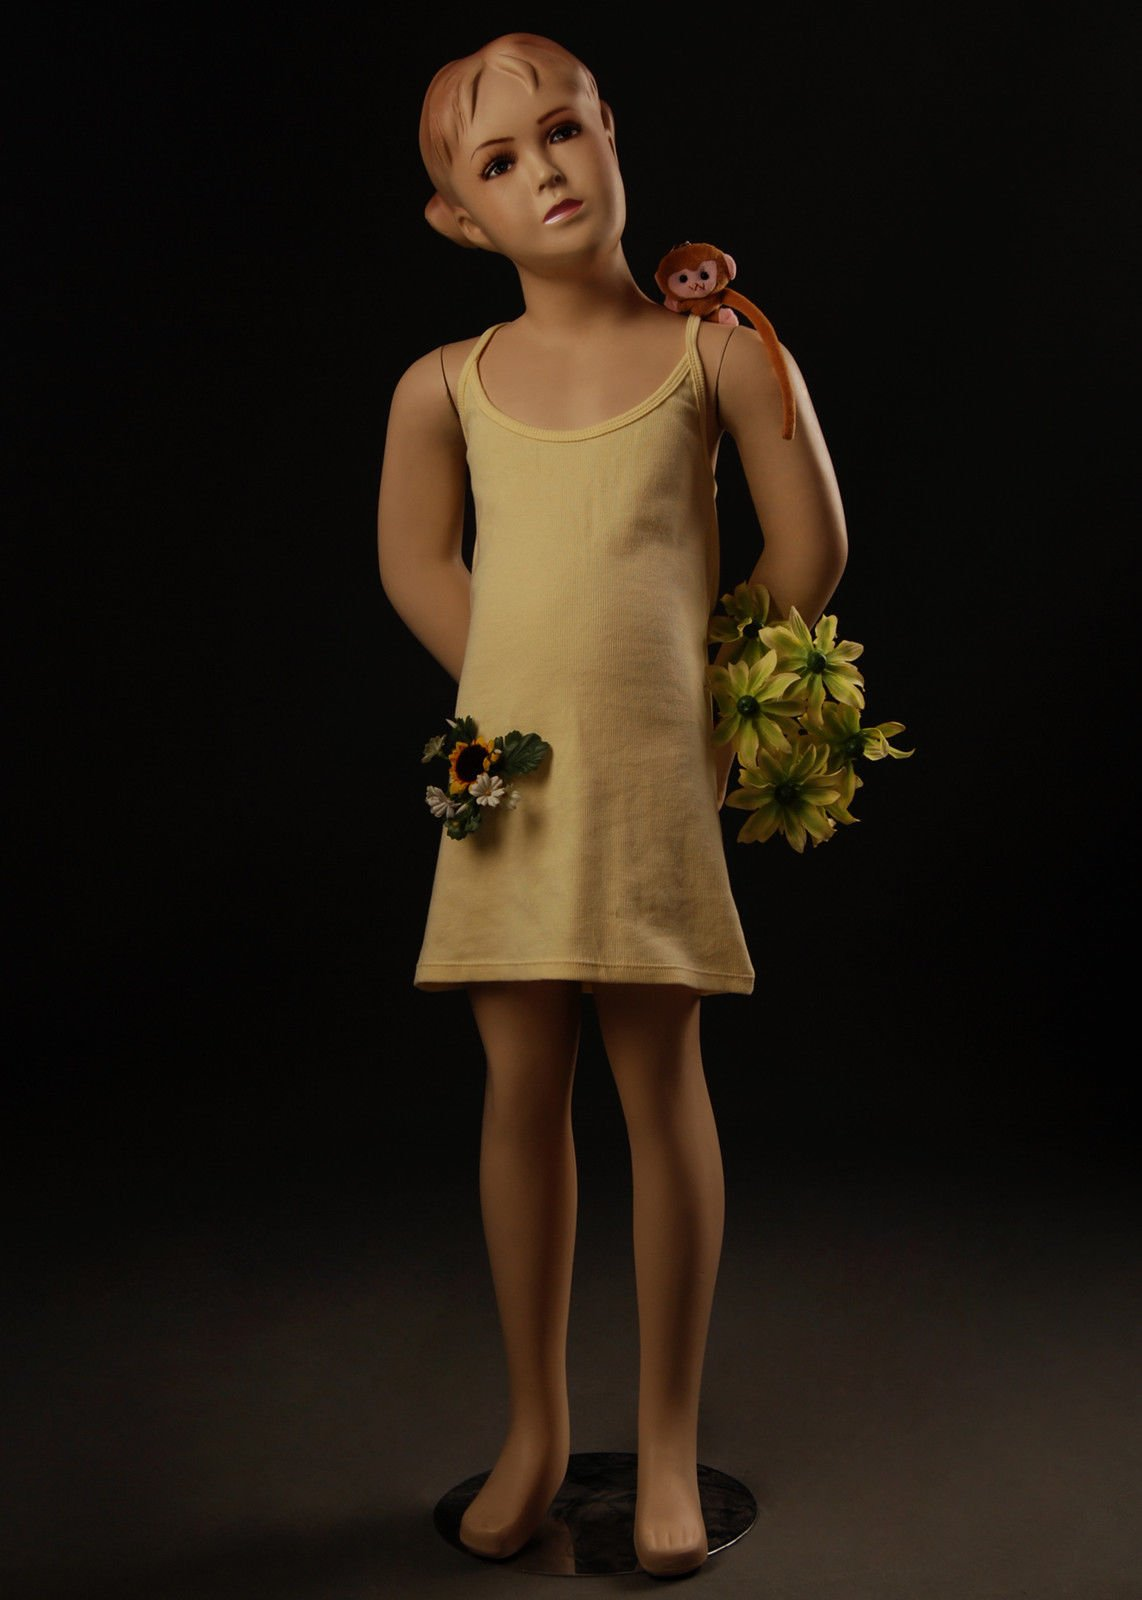 Beautiful Cute Child Girl Female Full Body Fiberglass Realistic Mannequin Flesh Tone 46'' Tall 23'' 22'' 24'' (KW1)